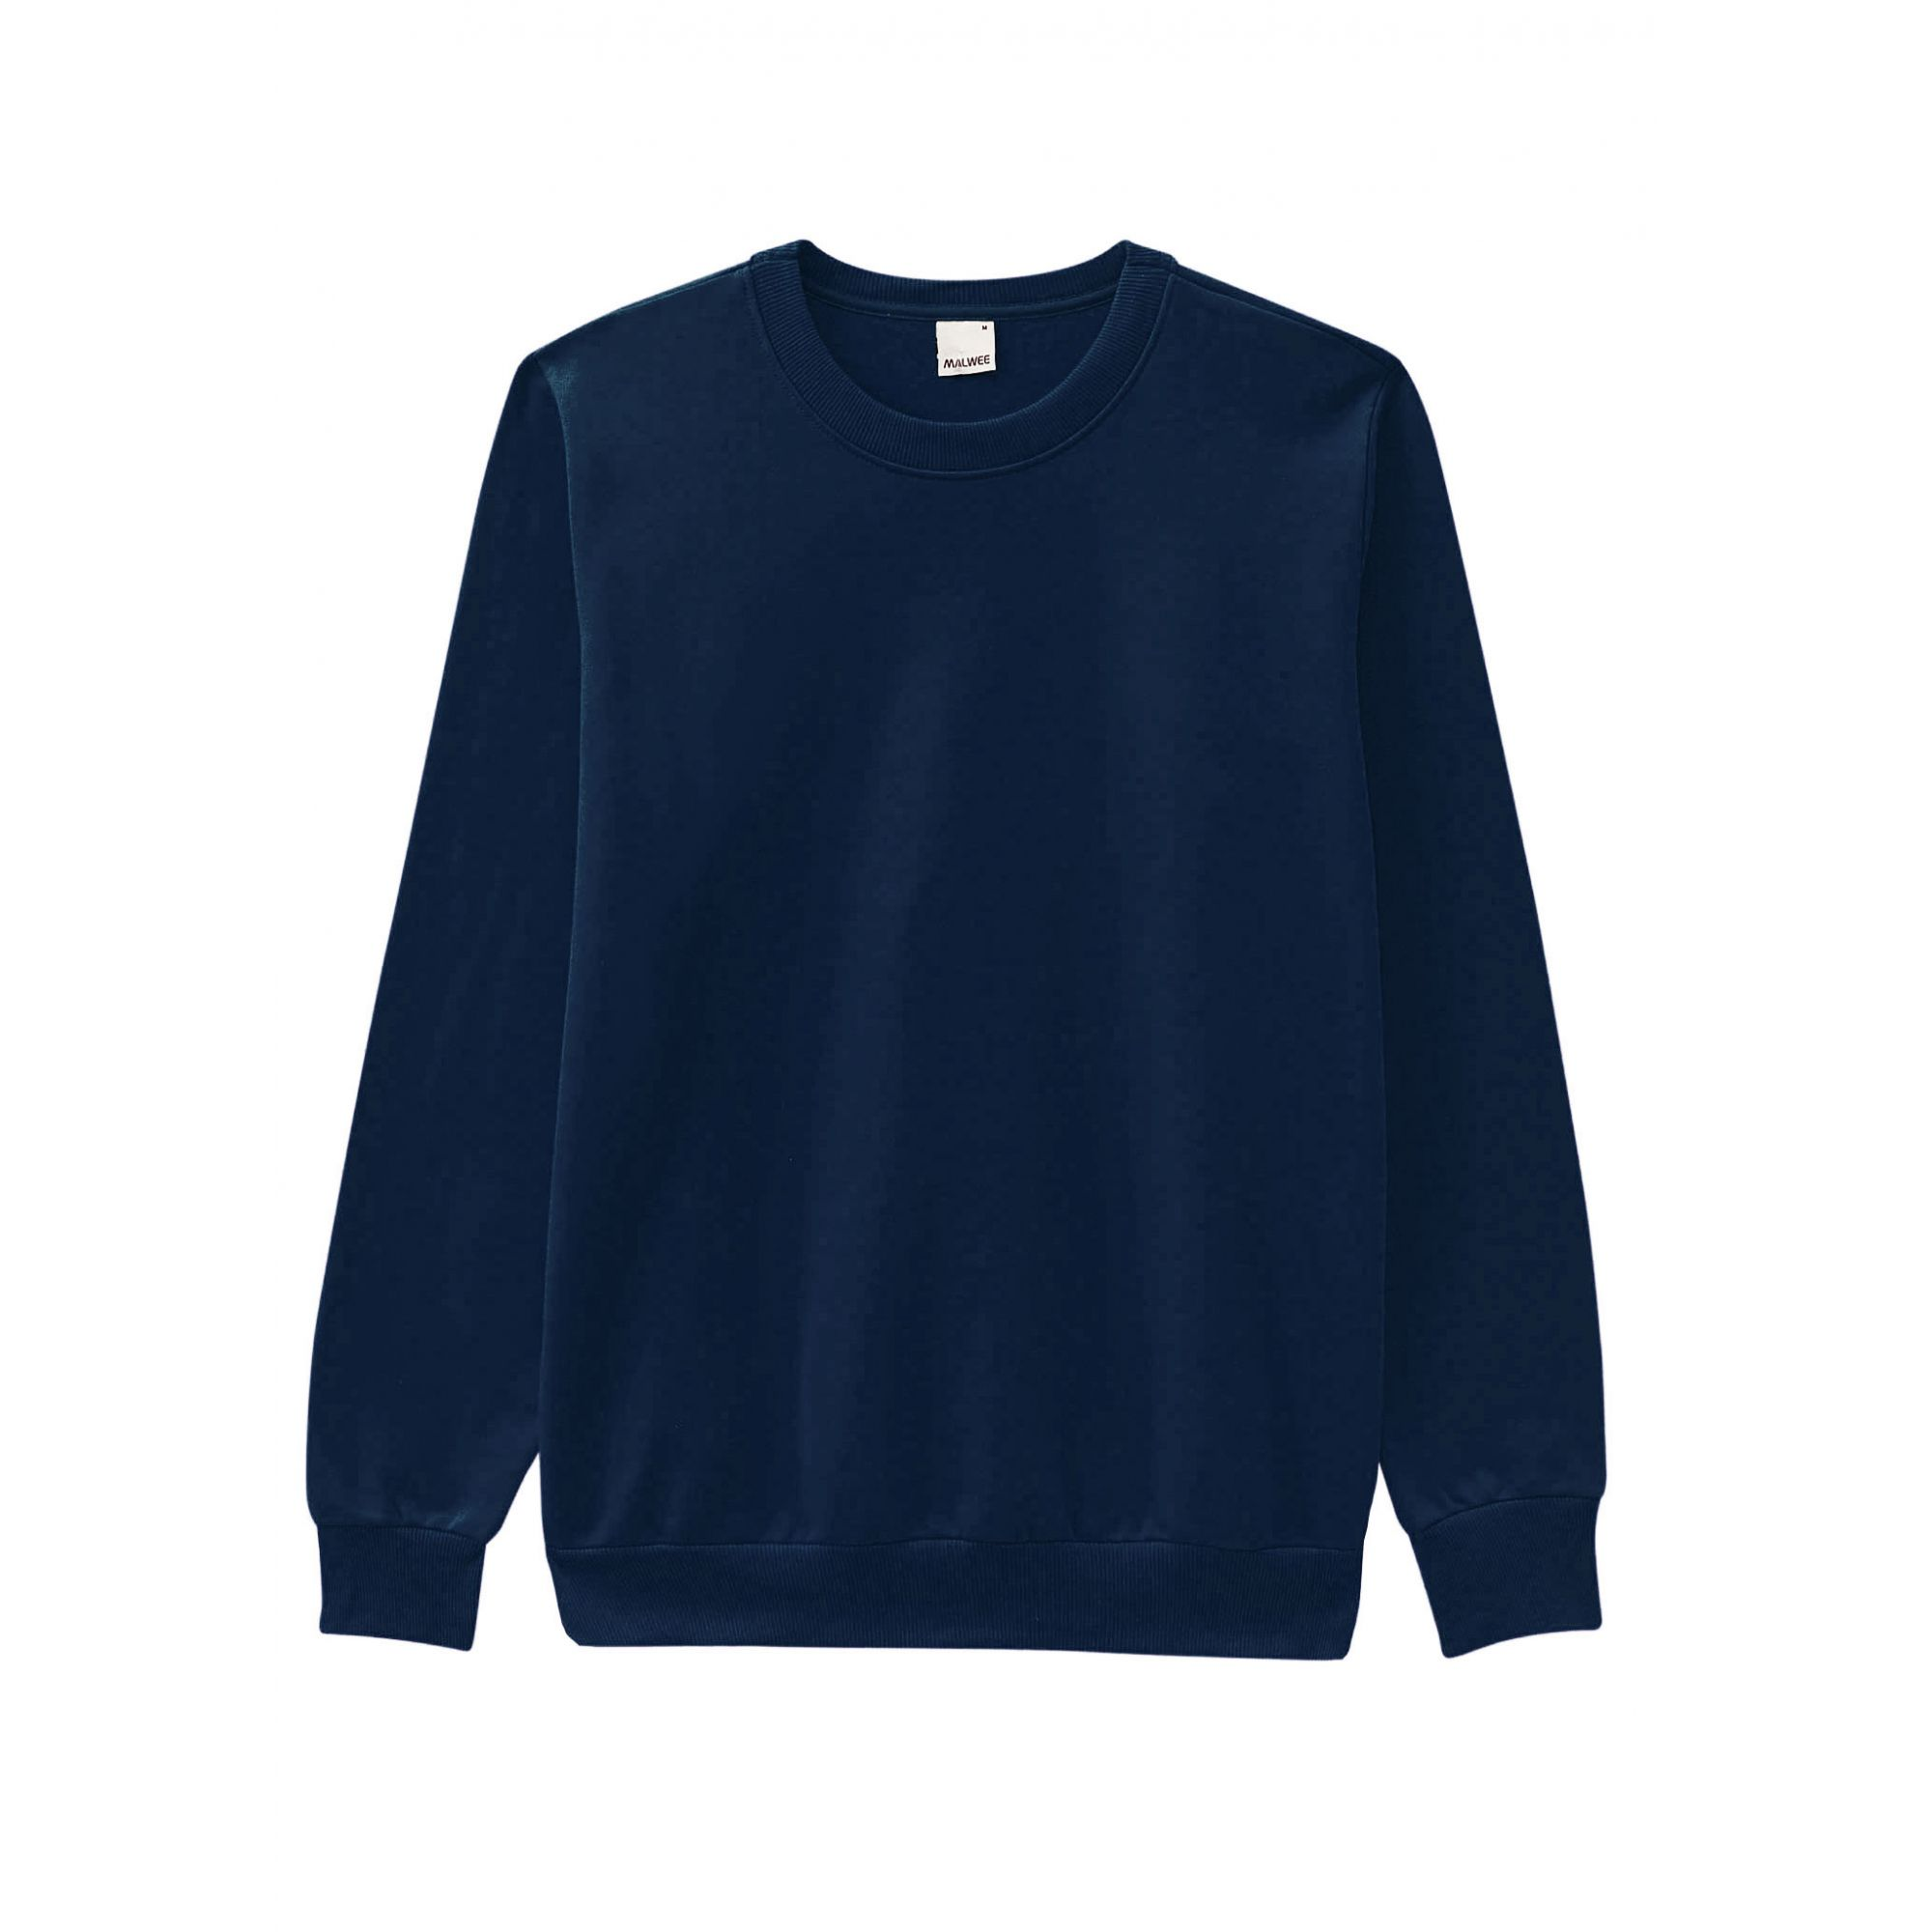 Casaco/Blusão ADULTO Masculino Inverno Azul Malwee